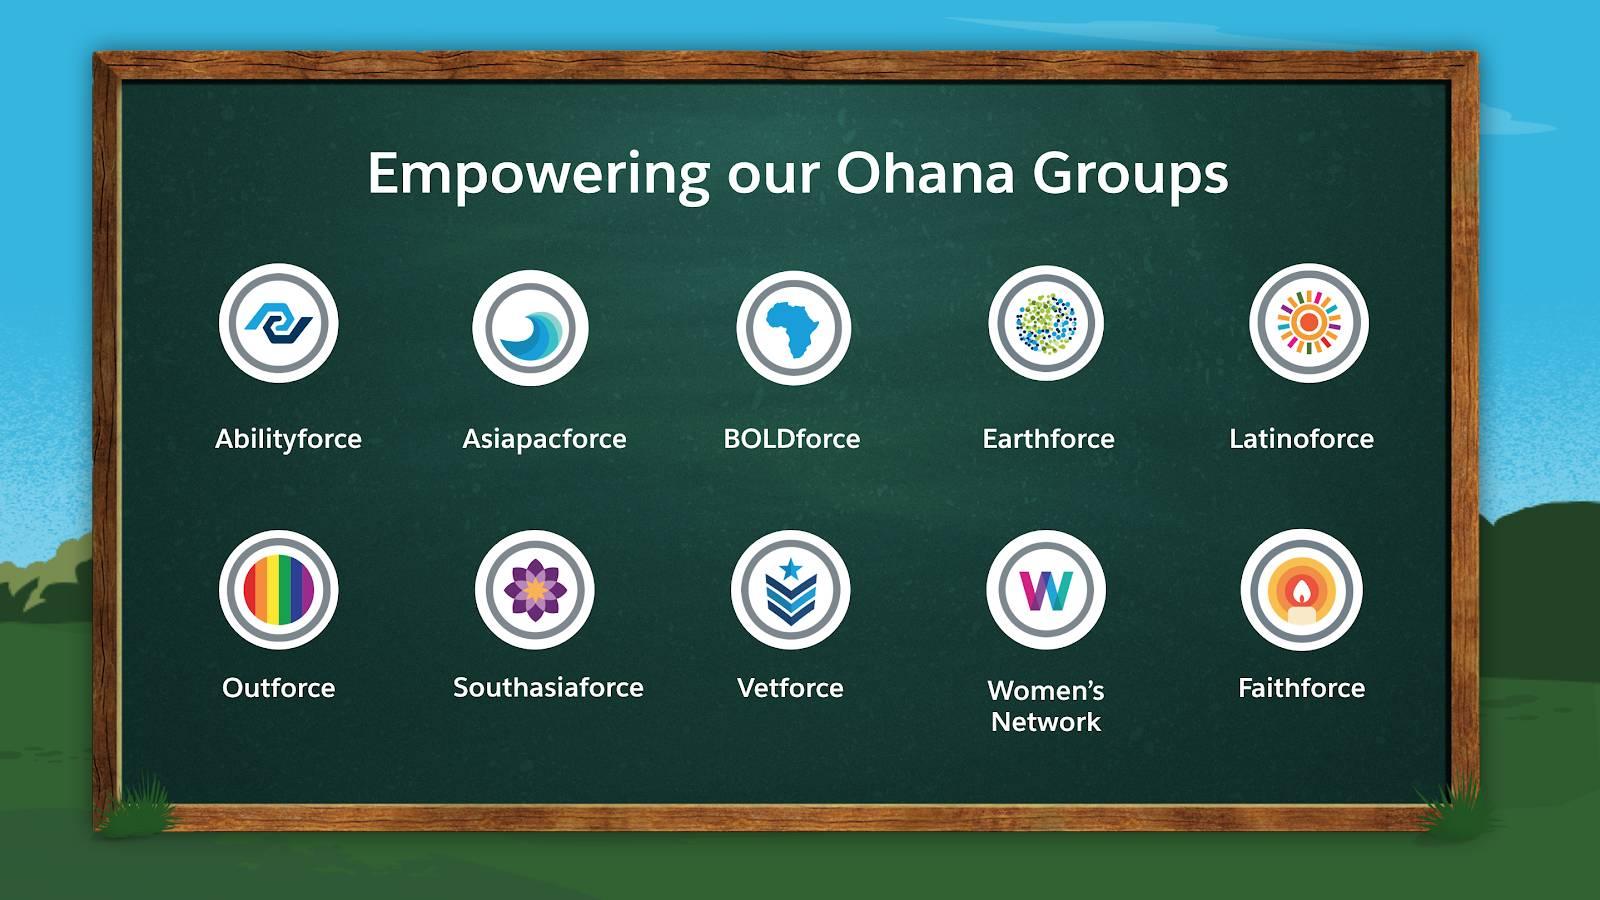 Photo of all the Ohana Group logos